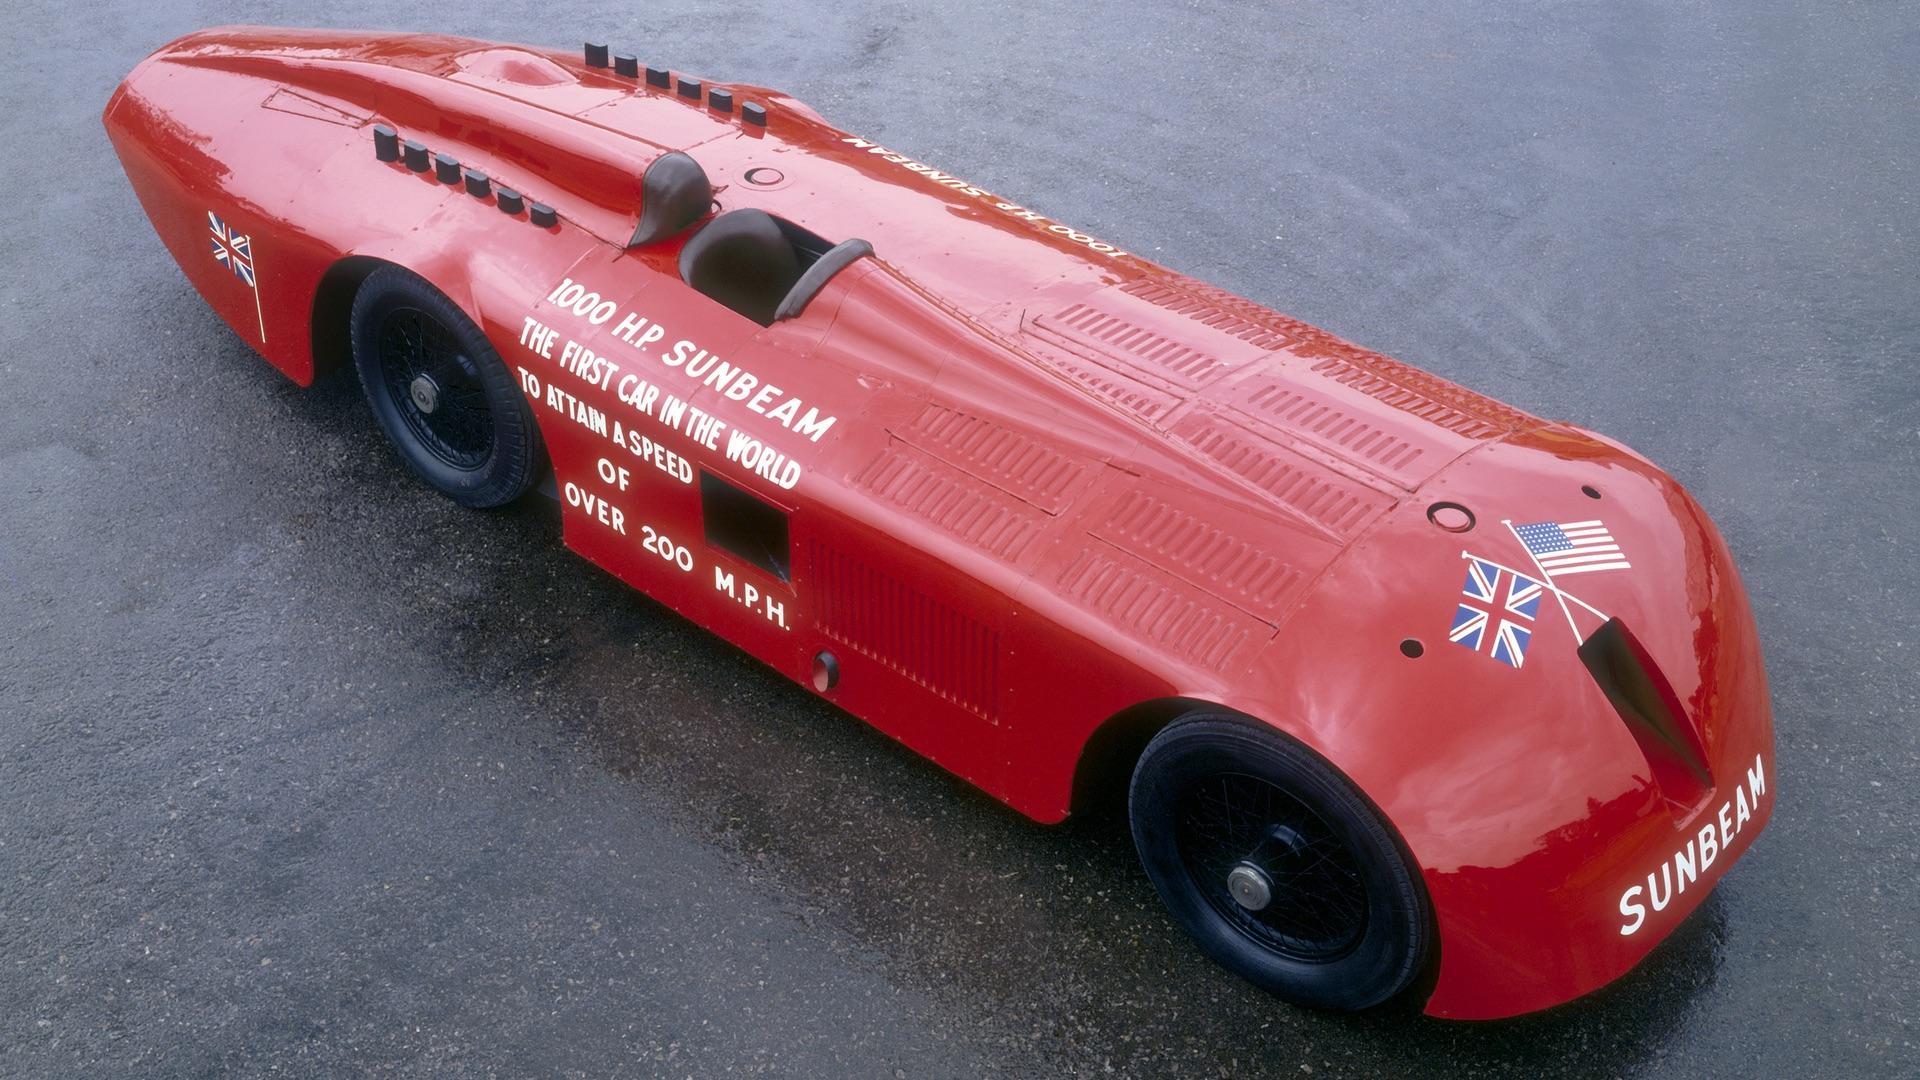 1,000-horsepower Sunbeam